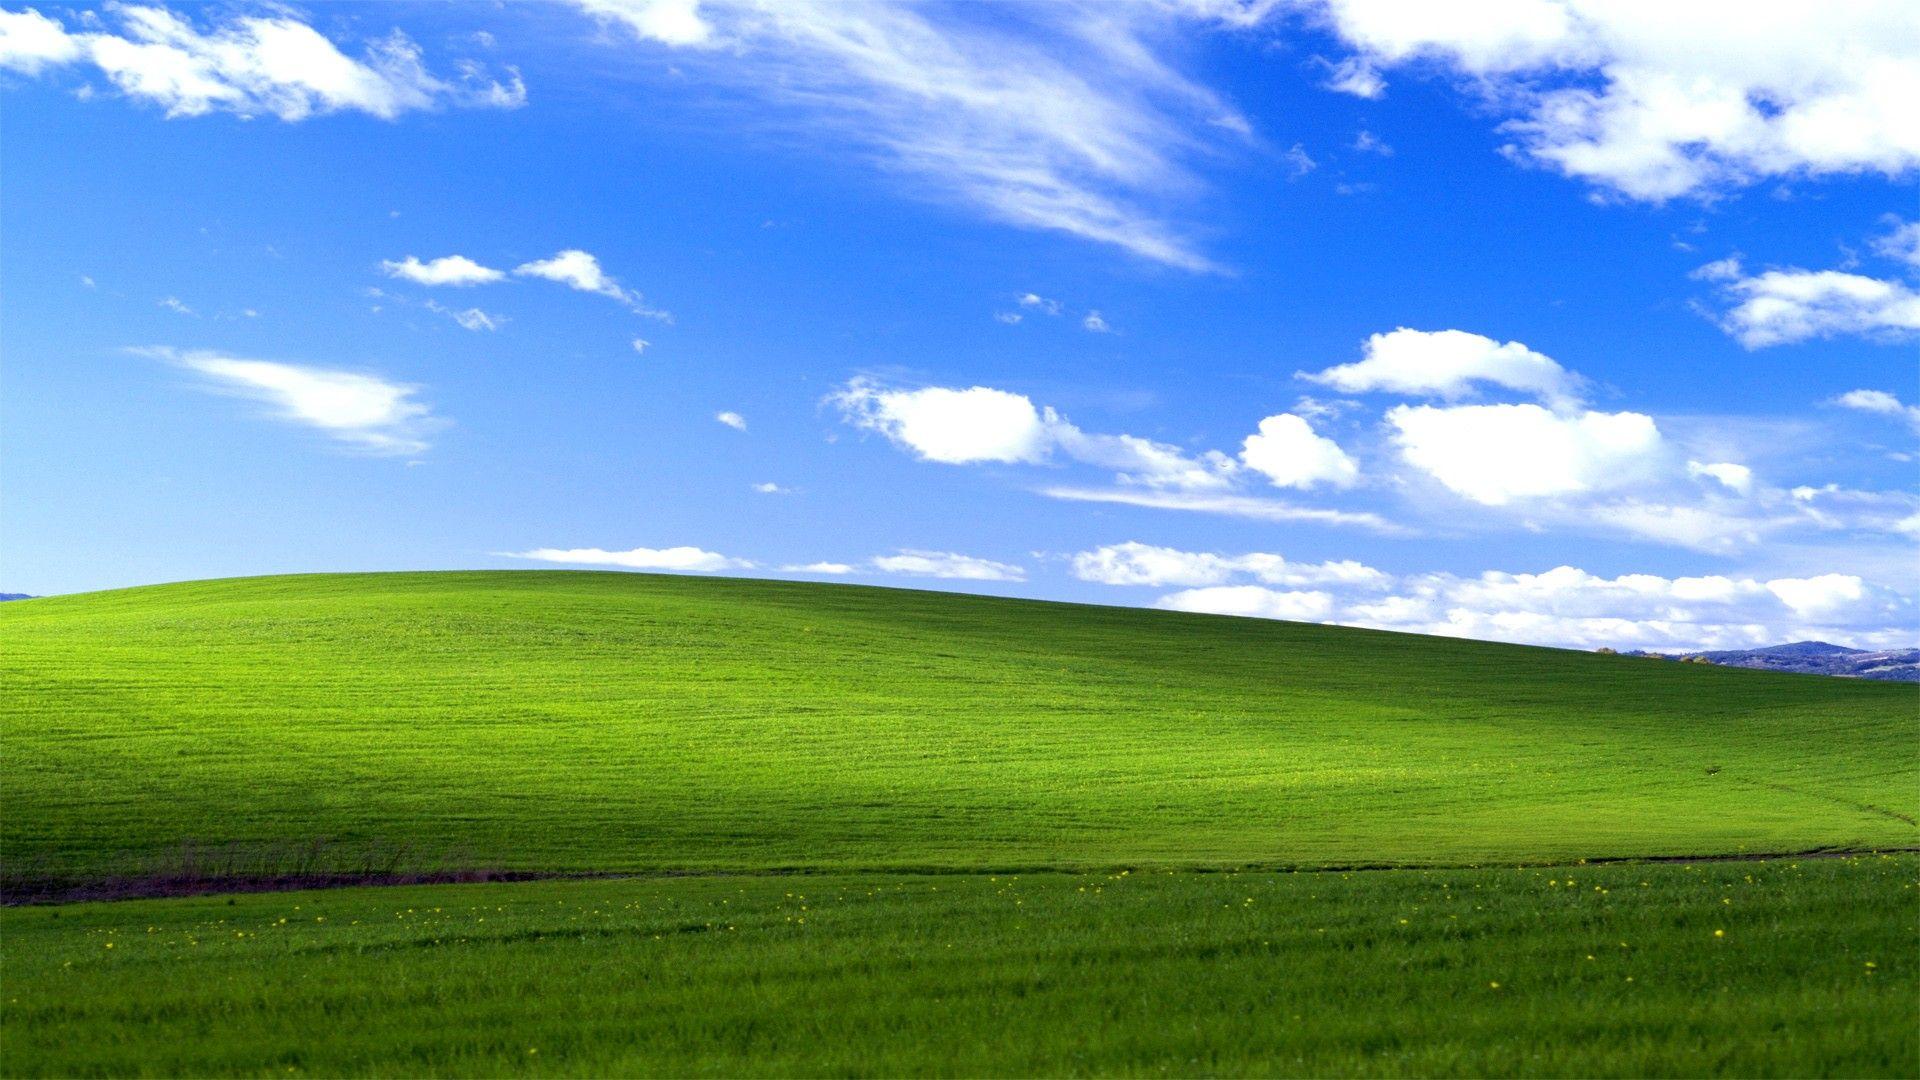 1920x1200 bliss desktop pc and mac wallpaper.html